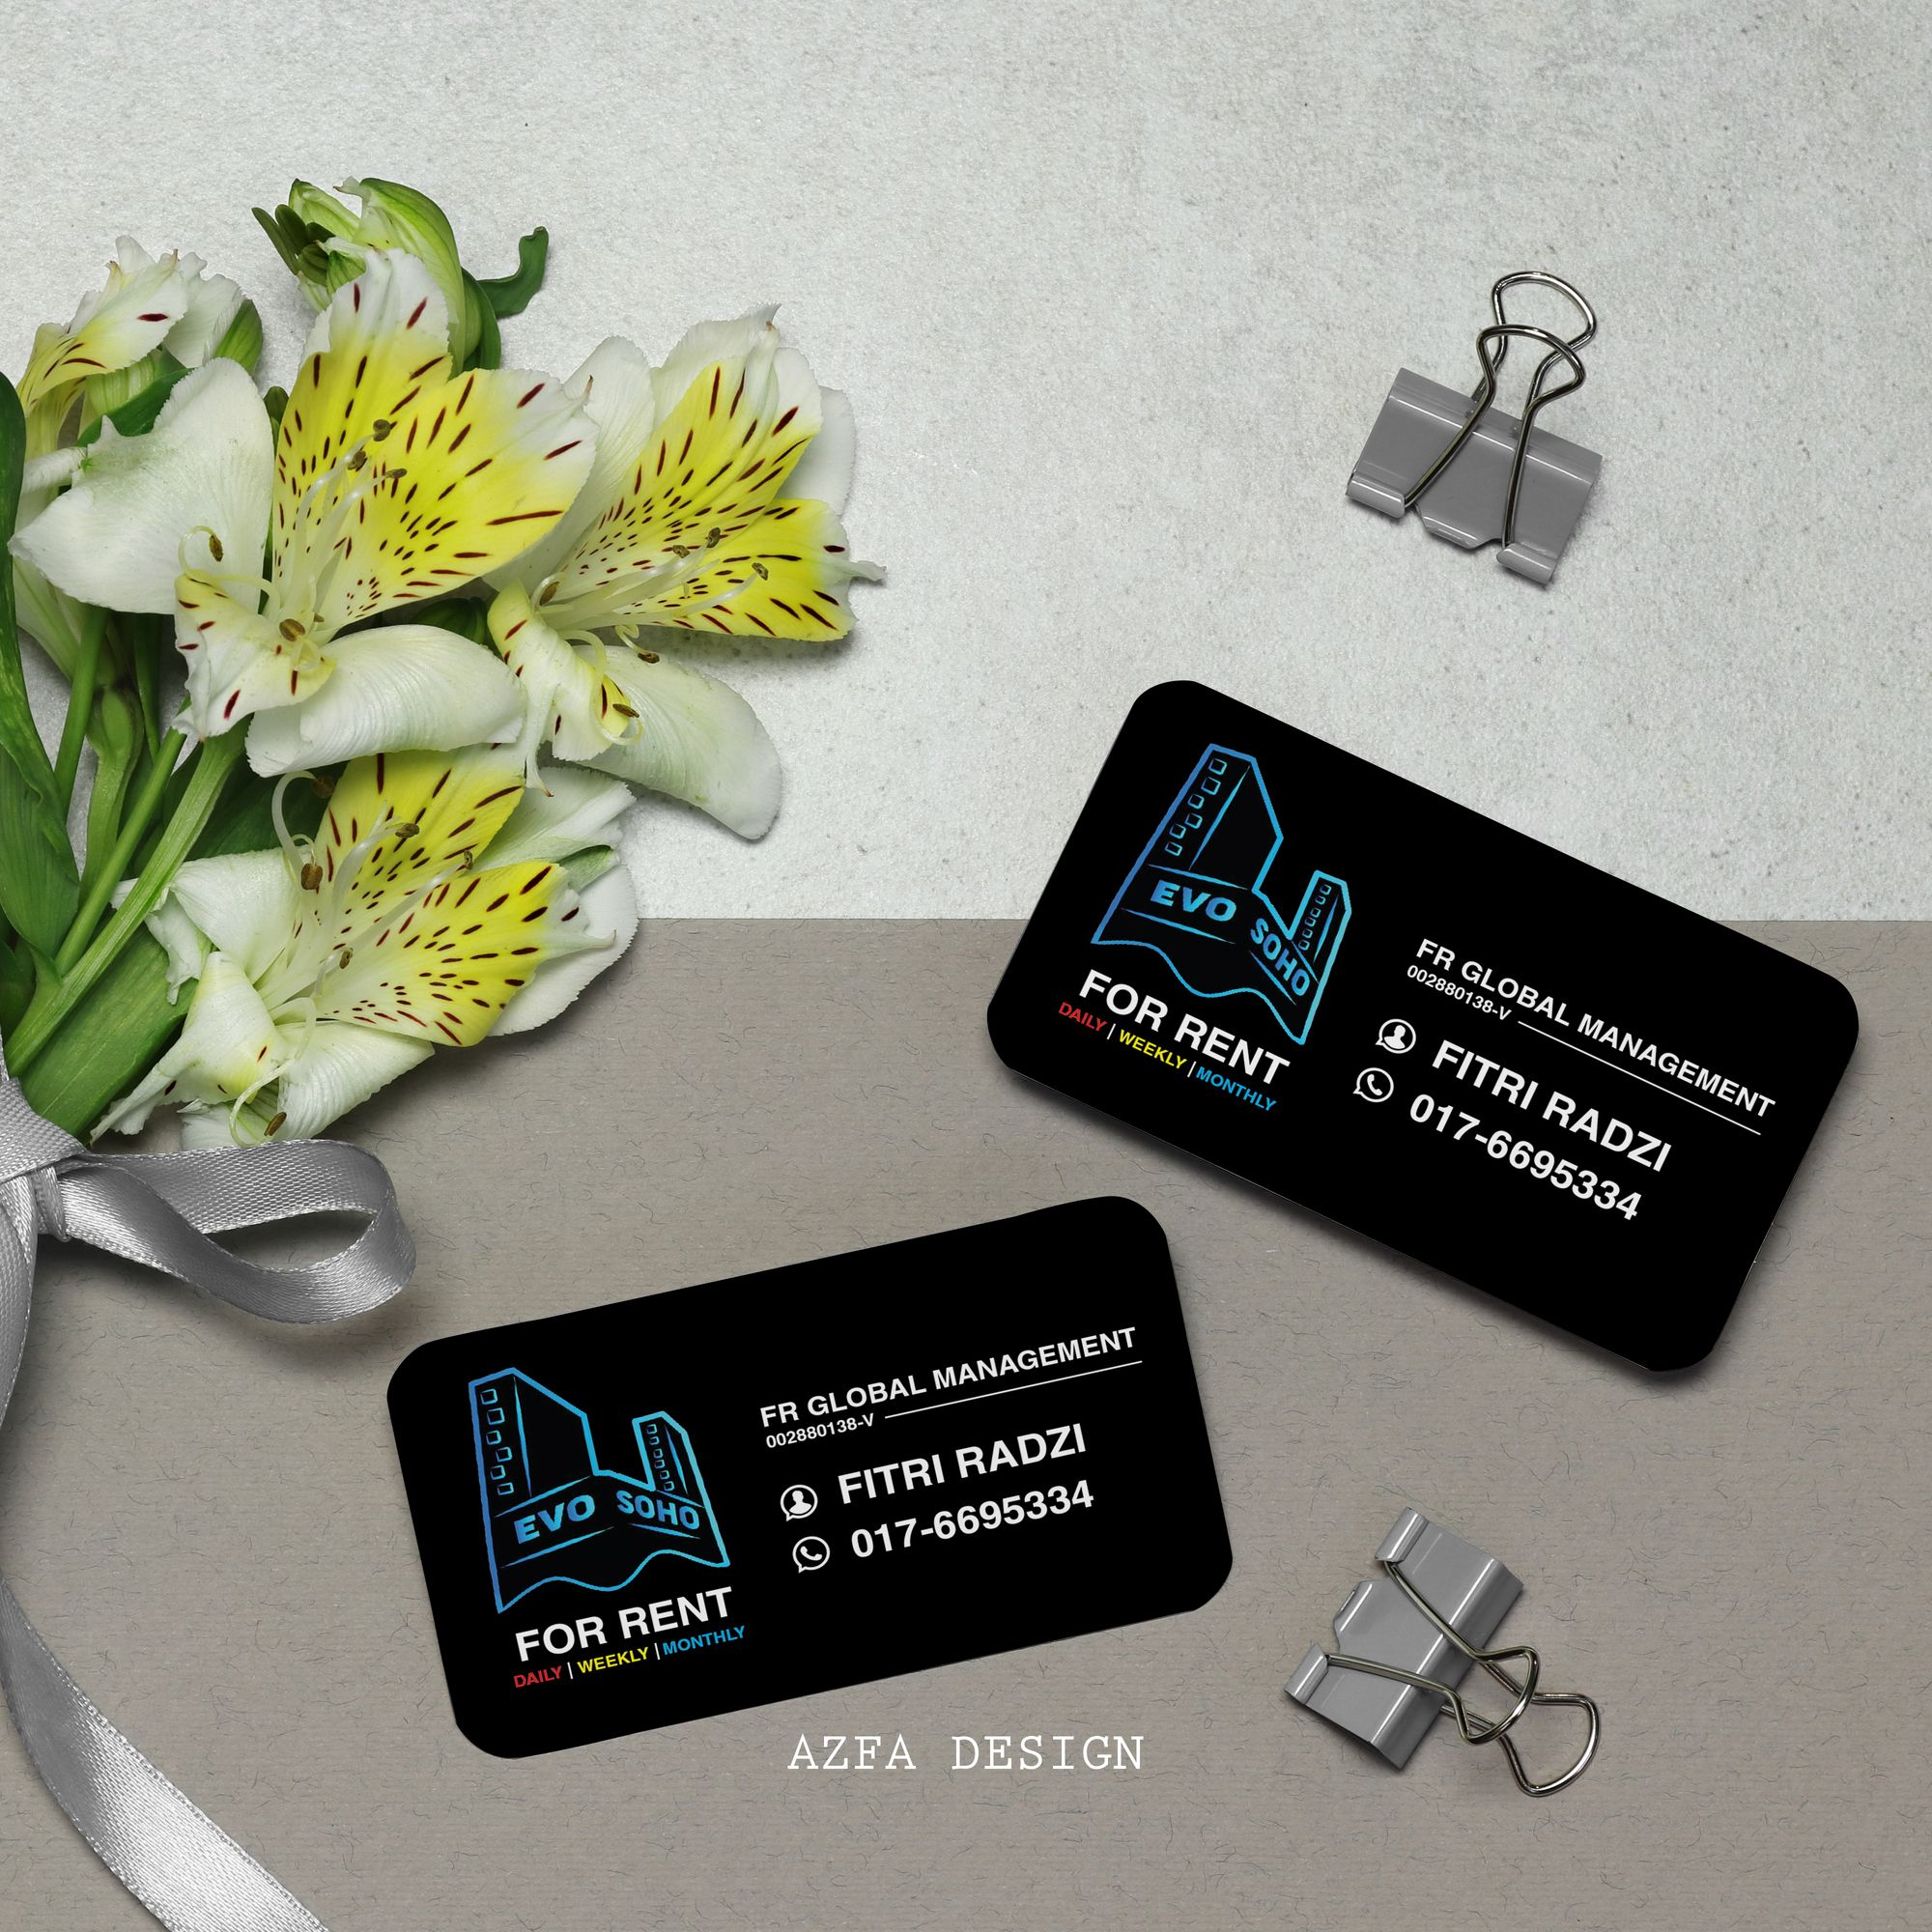 azfadesign bisneskad BOLEH BAGI BISNES KAD/NAME CARD